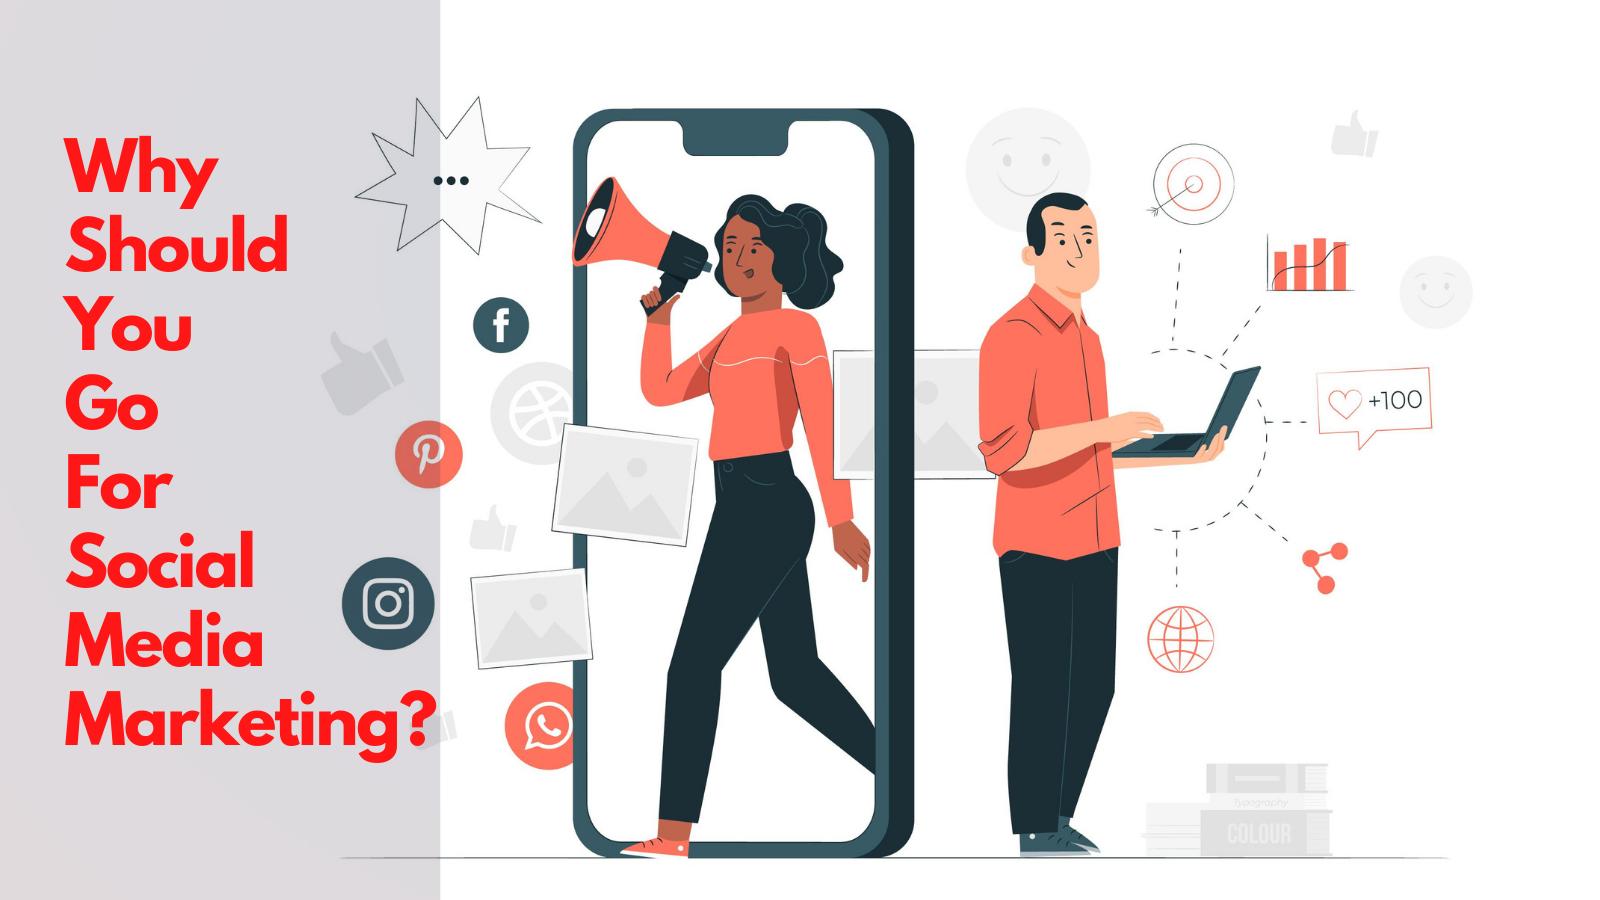 why-should-you-go-for-social-media-marketing